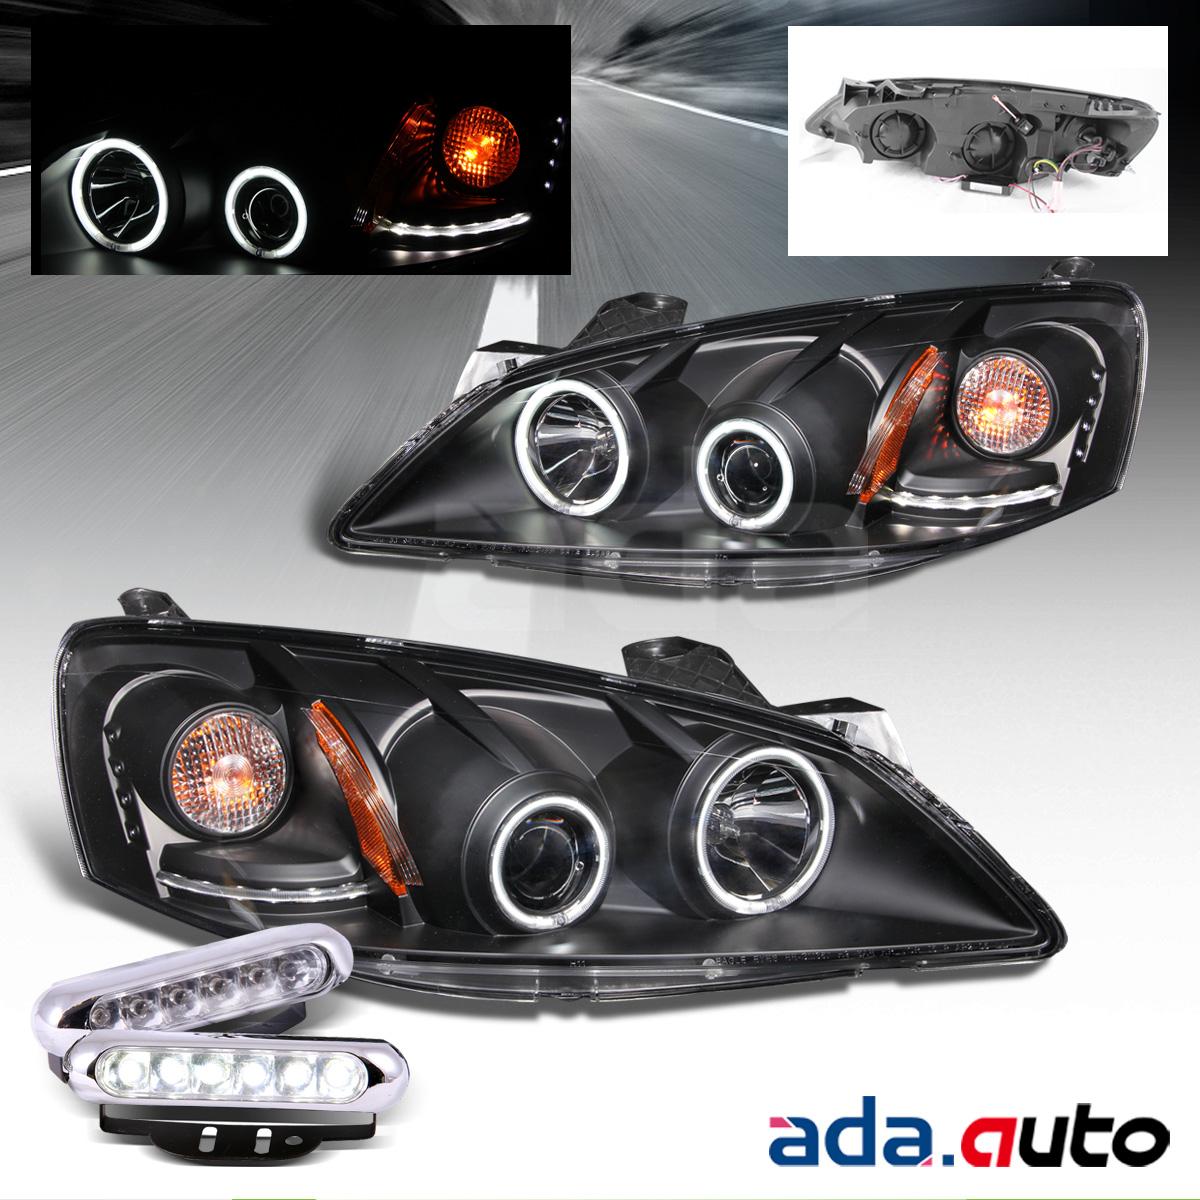 hight resolution of 2005 2010 pontiac g6 ccfl halo projector headlights led fog lamps set